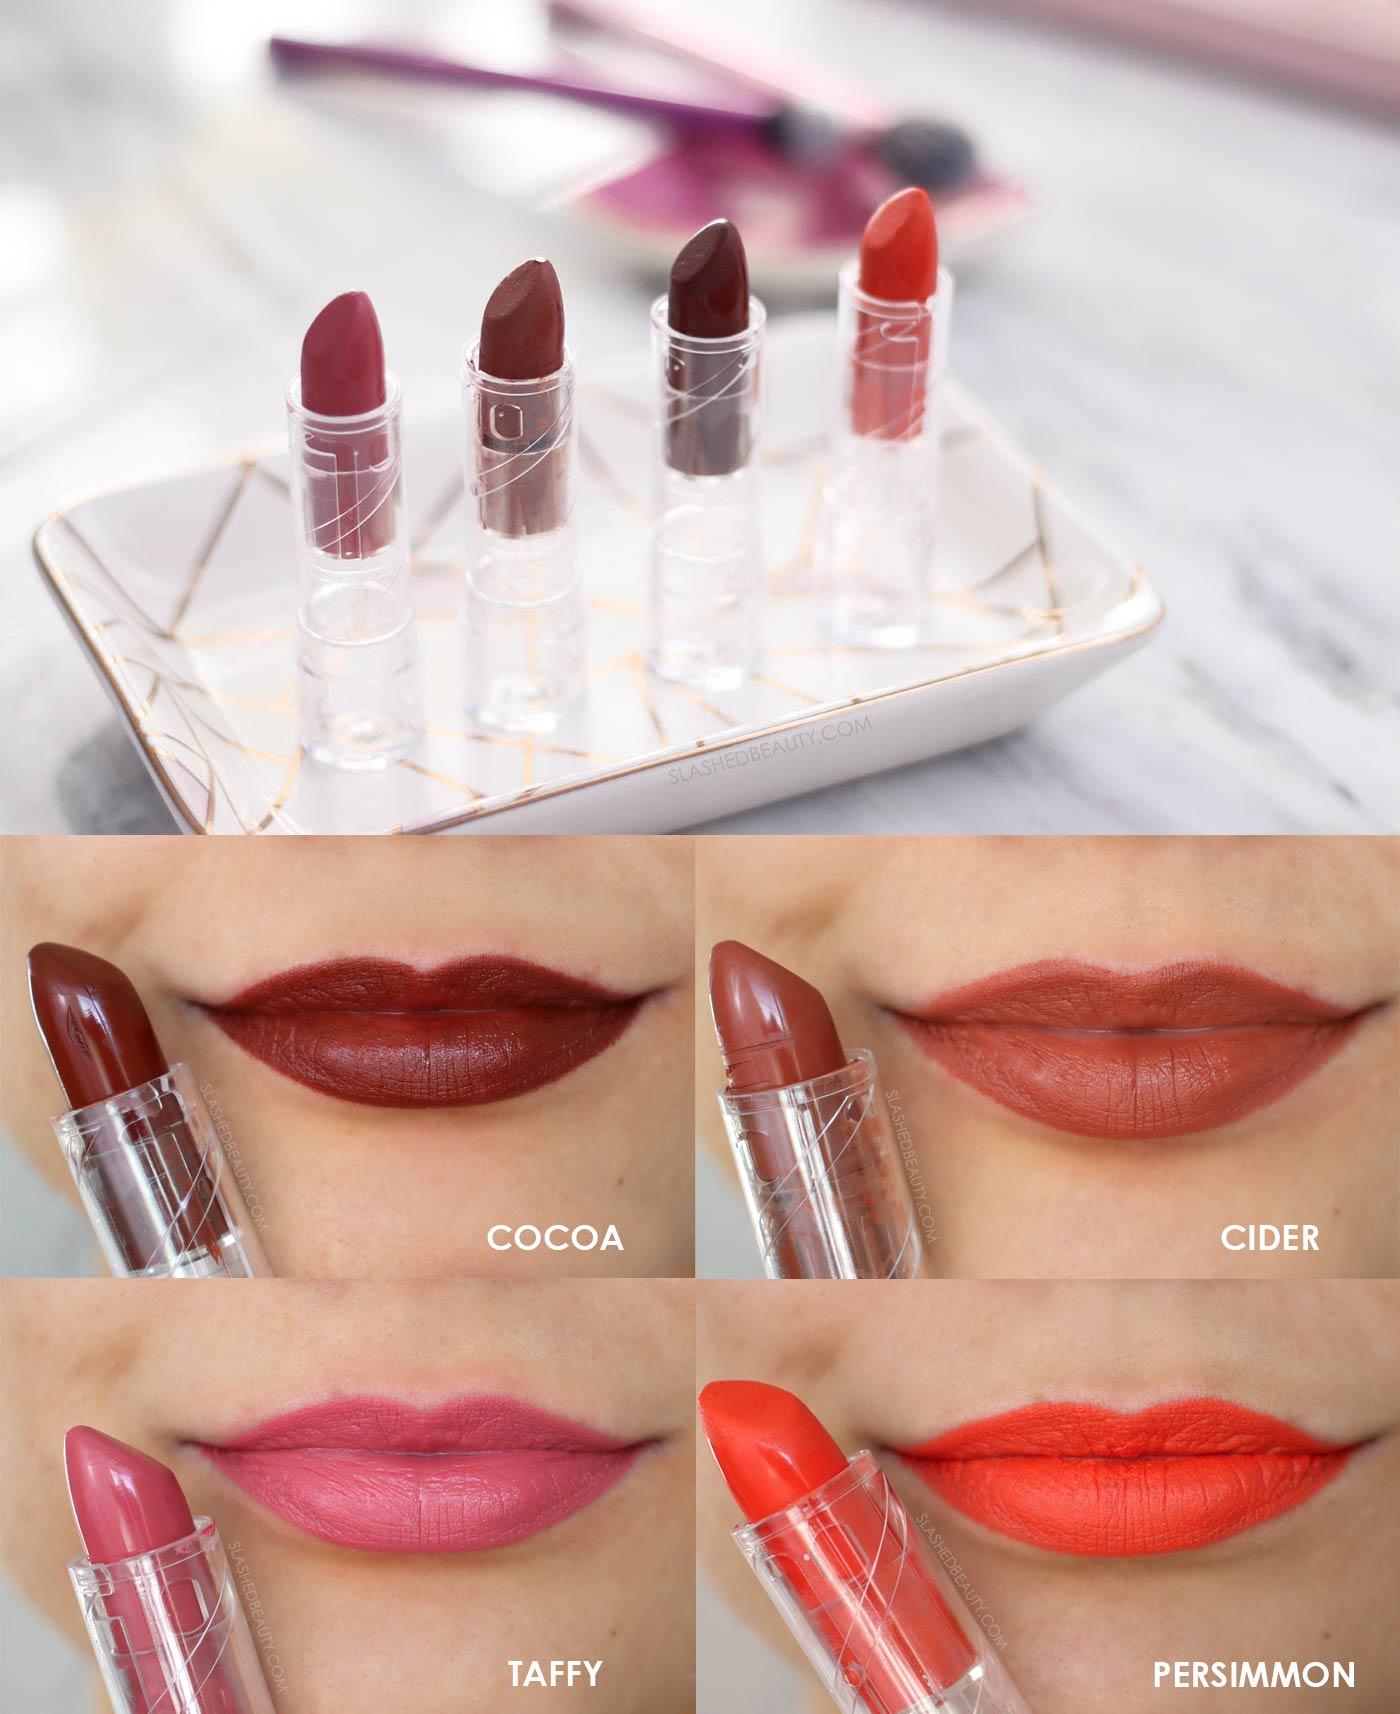 e.l.f. SRSLY Satin Lipsticks Swatches   Cocoa, Cider, Taffy, Persimmon   Slashed Beauty